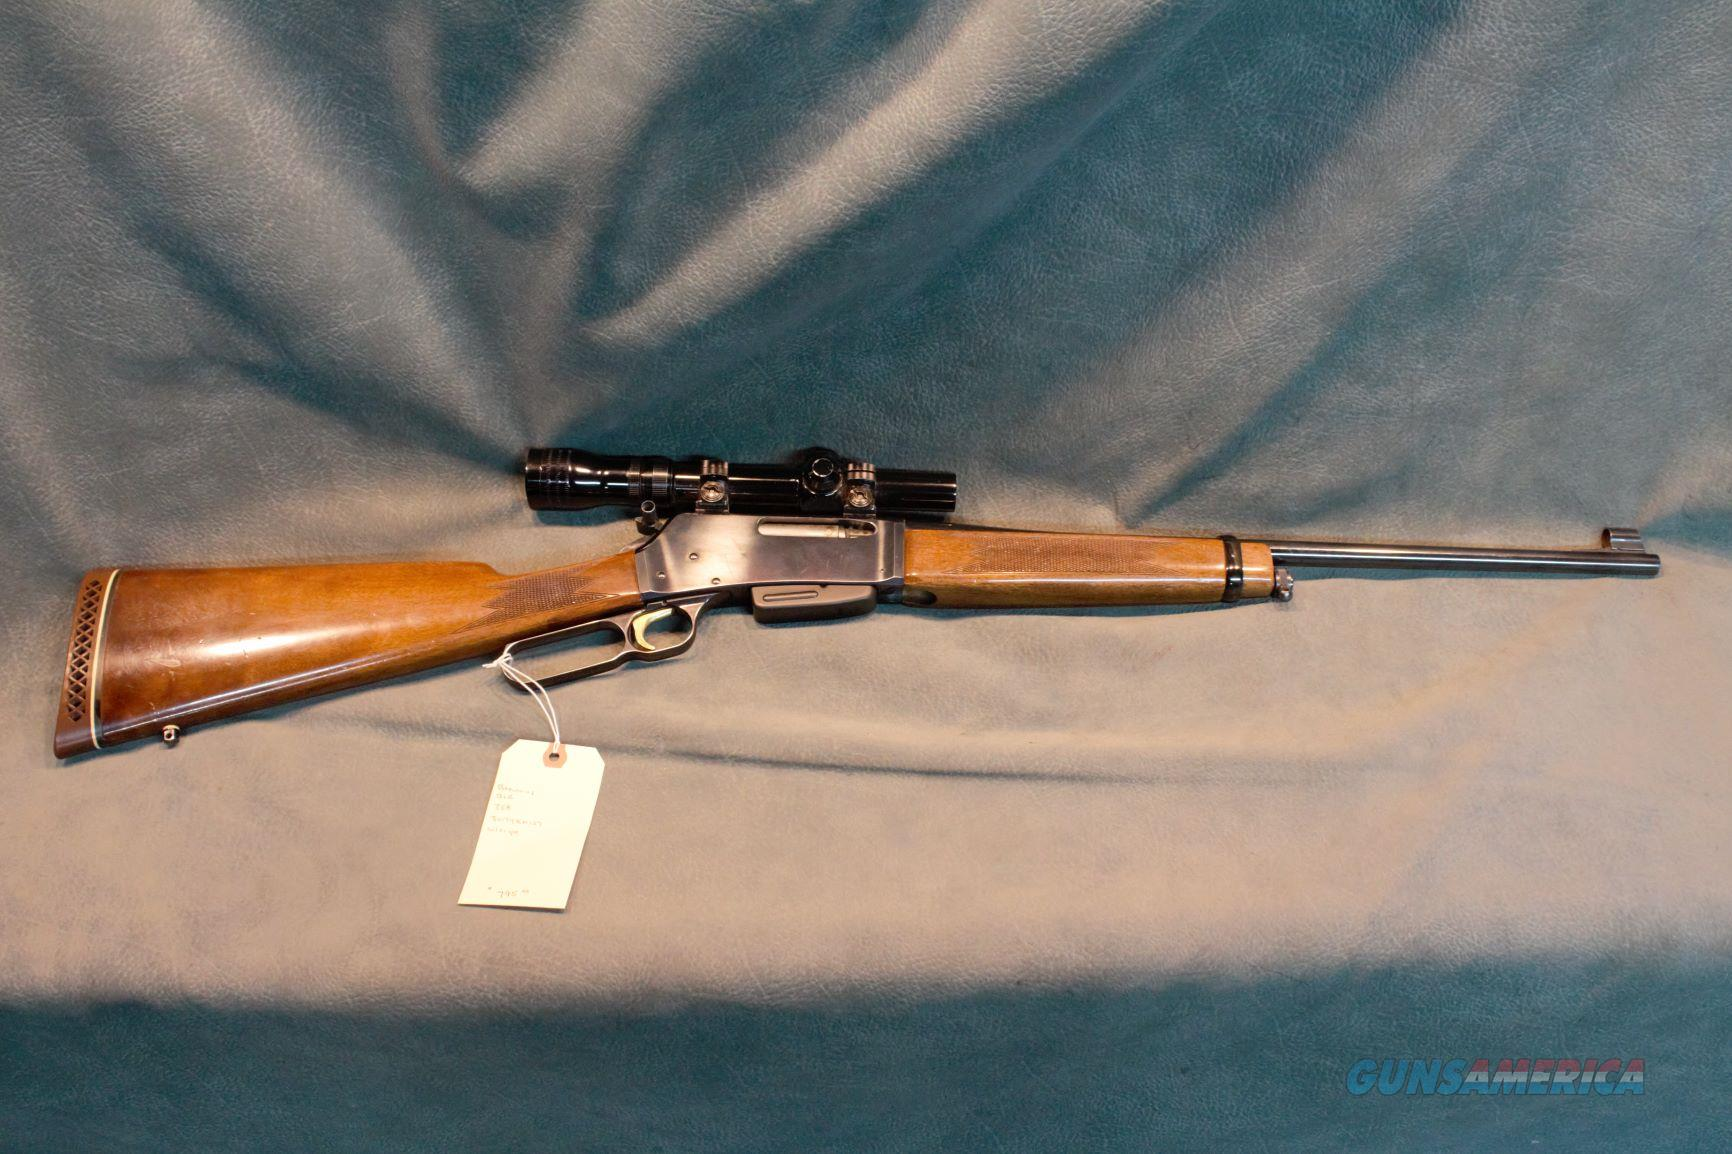 Browning BLR 358 Win  Guns > Rifles > Browning Rifles > Lever Action